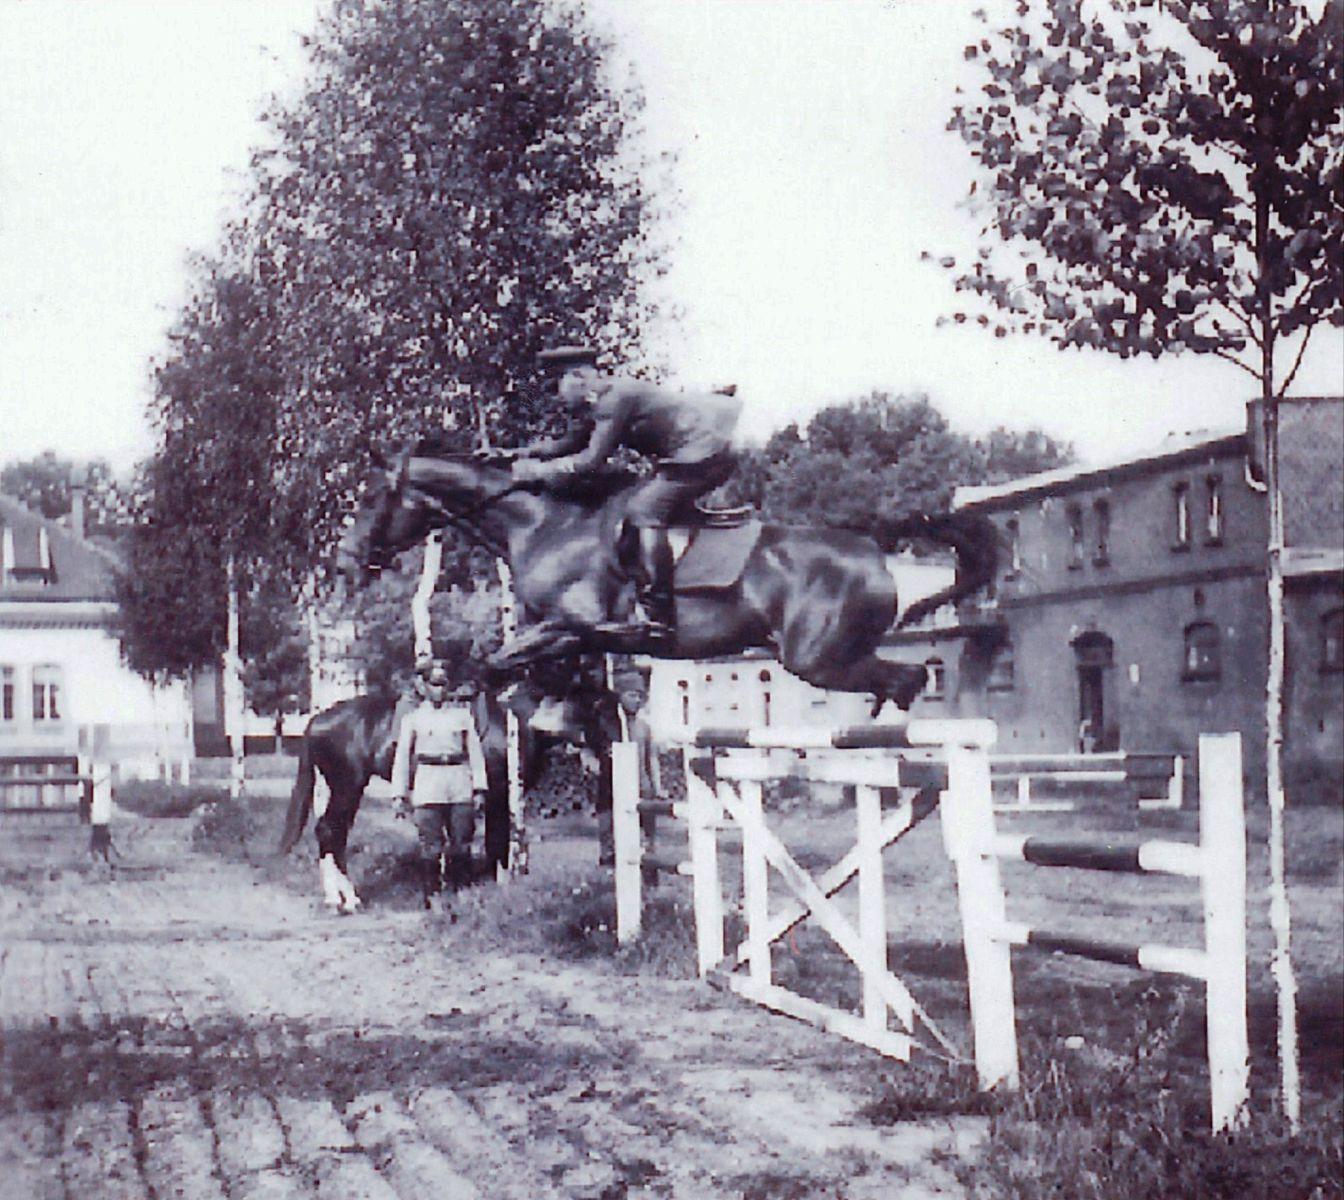 Oscar Engelhardt, a cavalry officer, at the Trakehnen stud in 1936. Photo courtesy of Engelhardt Family Archives.